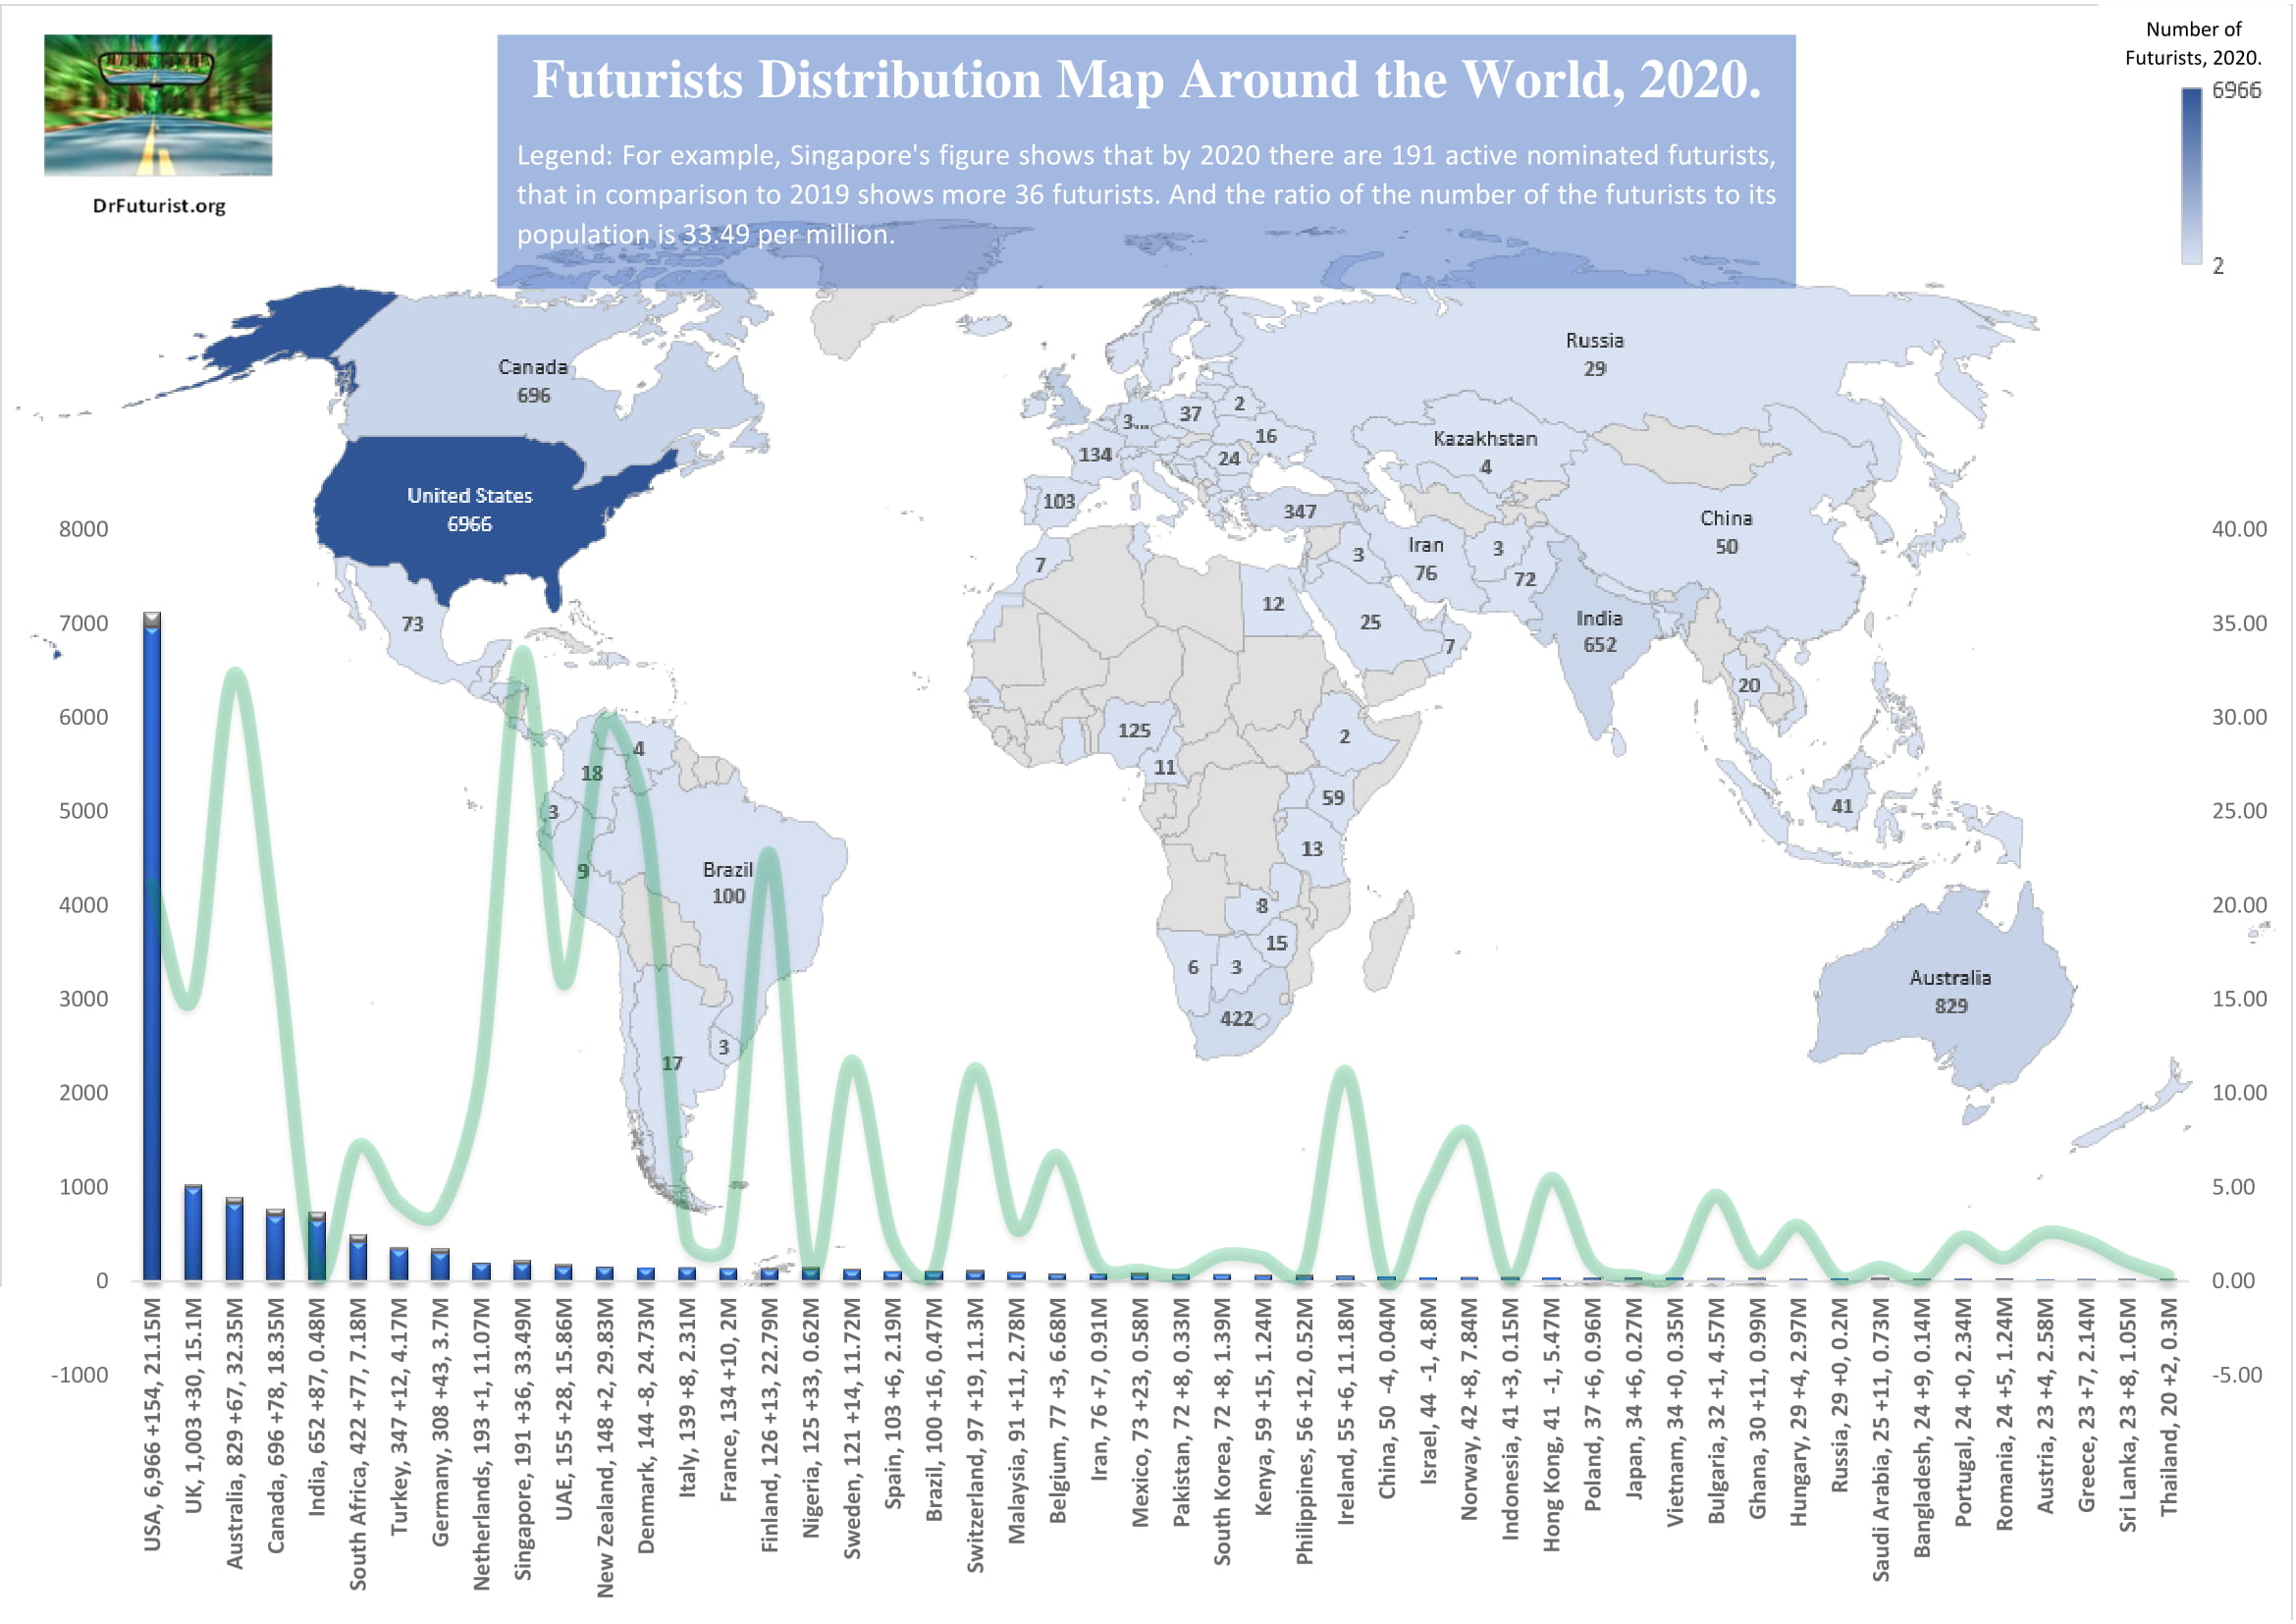 2020 Futurists Distribution Map Around the World DrFuturist.org #Future #Futurist #Foresight #Futures_Studies #DrFuturist